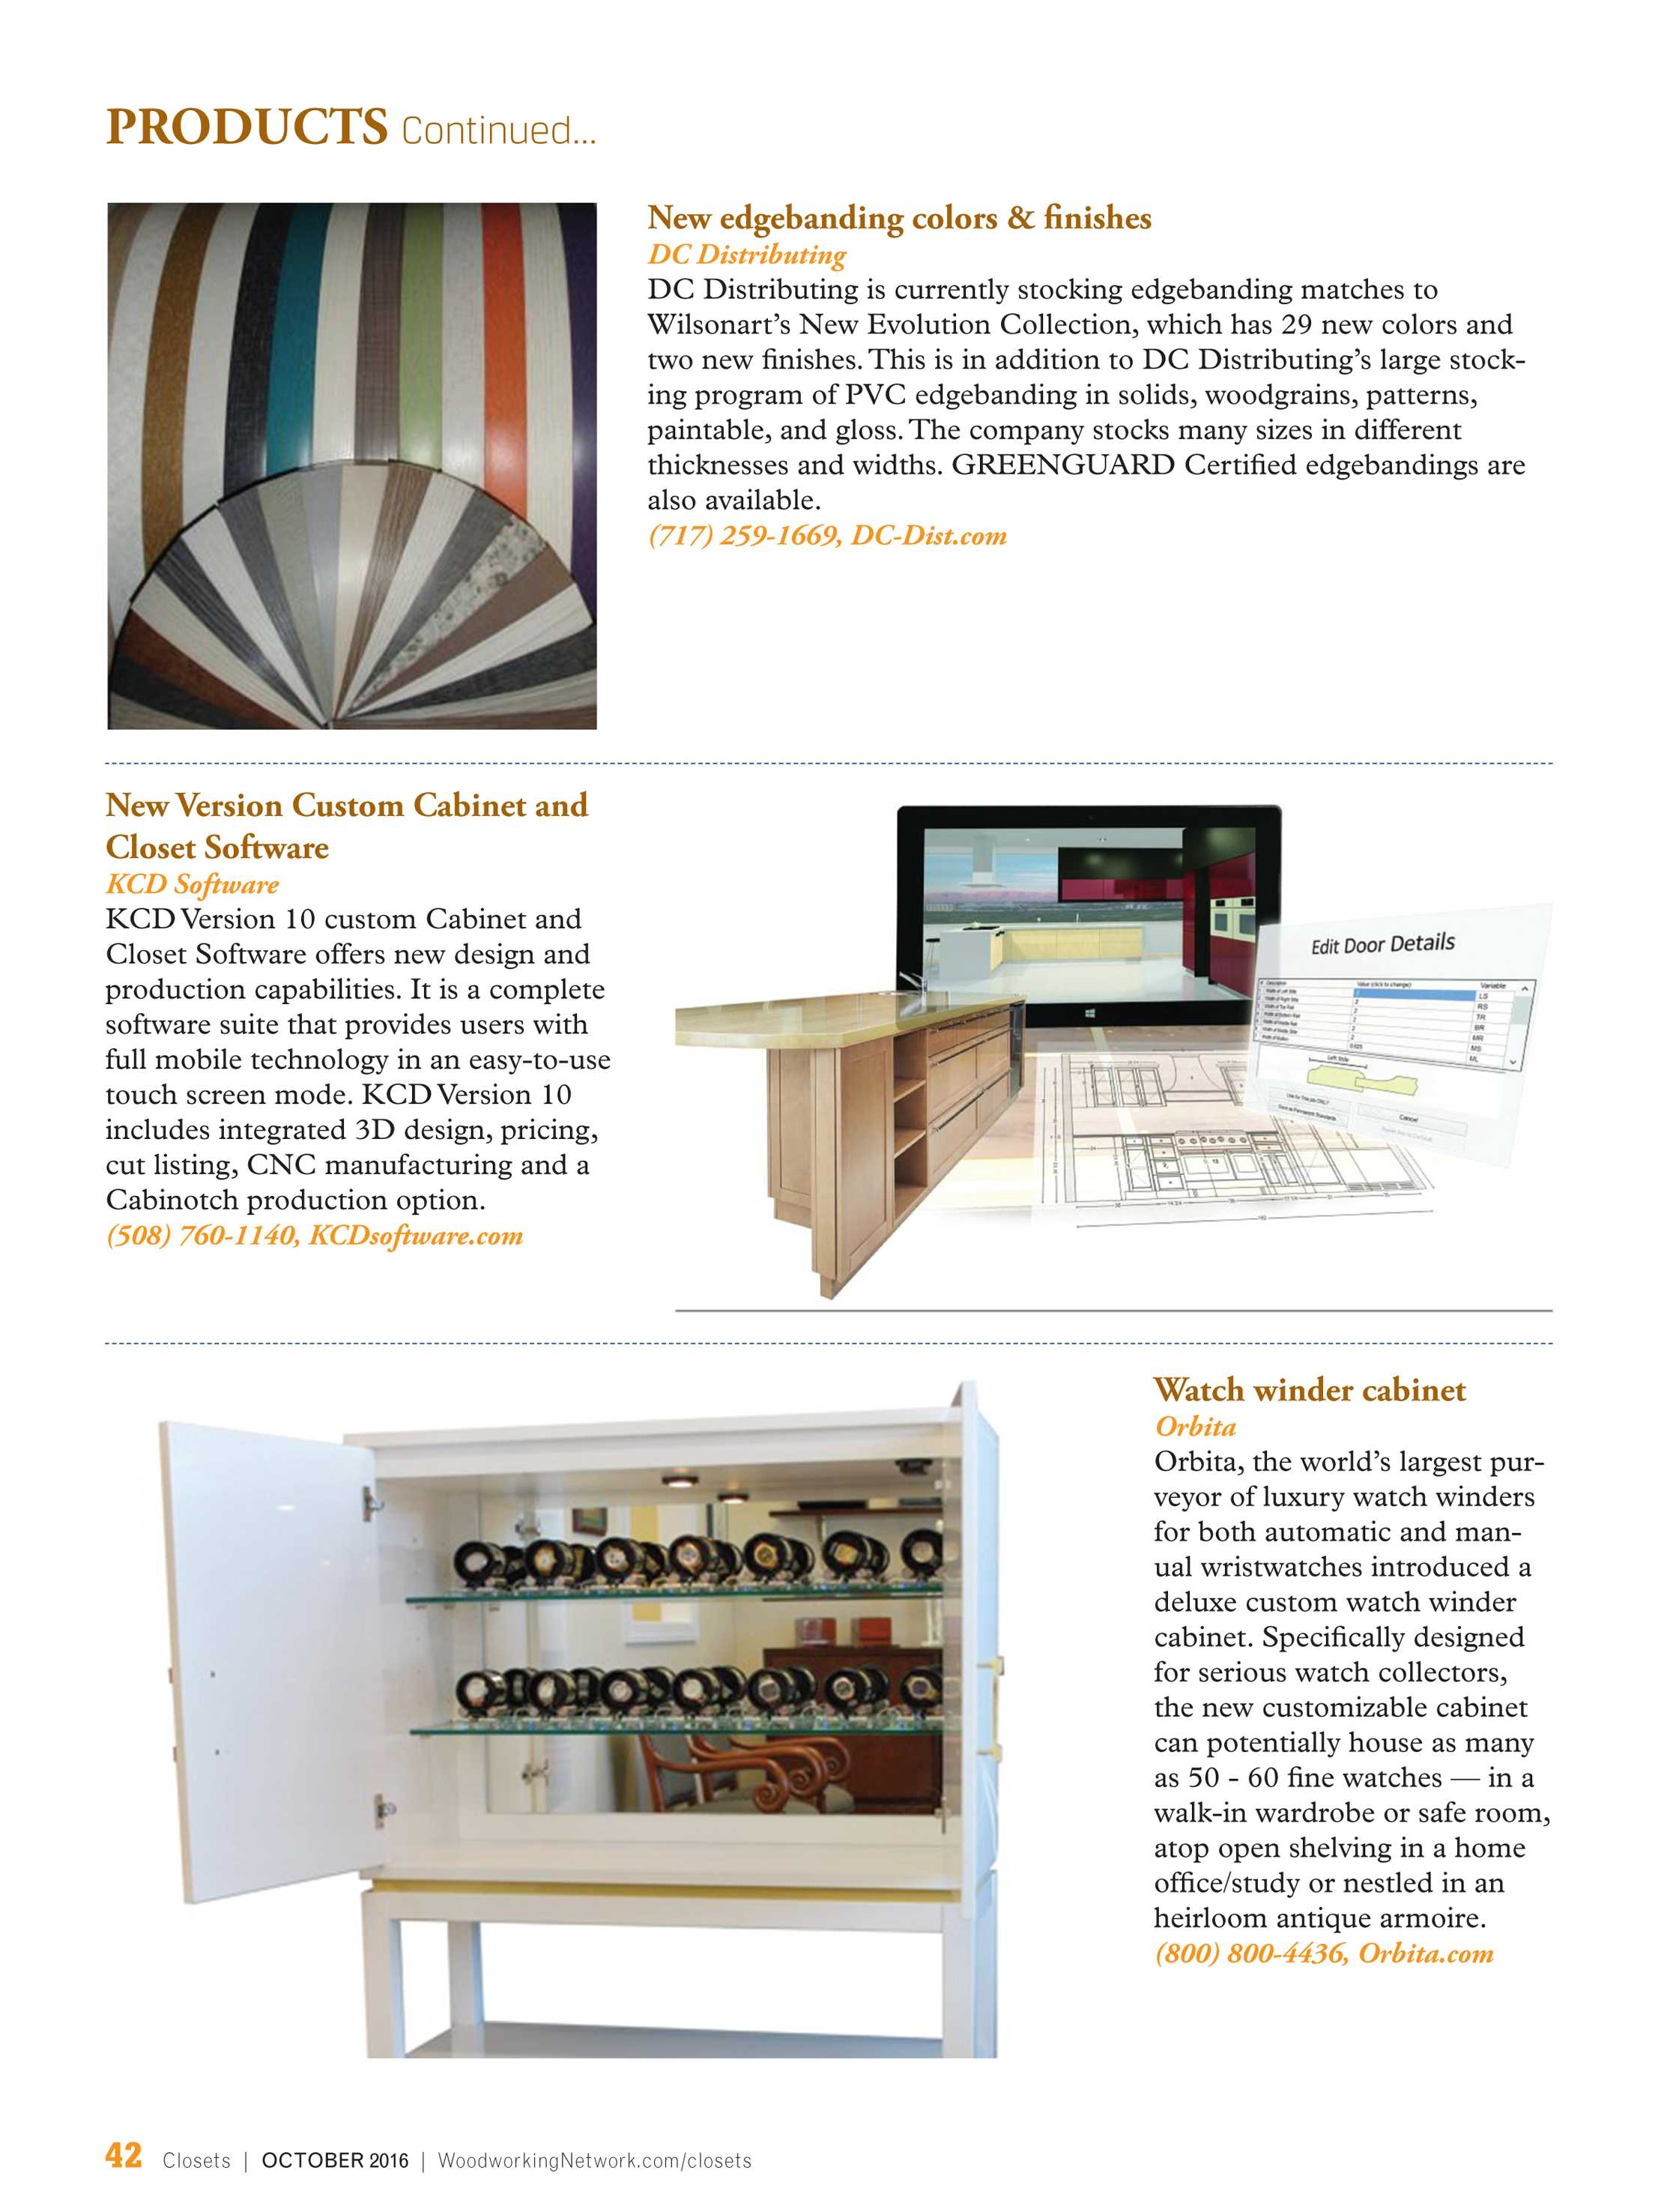 Closets Magazine October 2016 Page 42